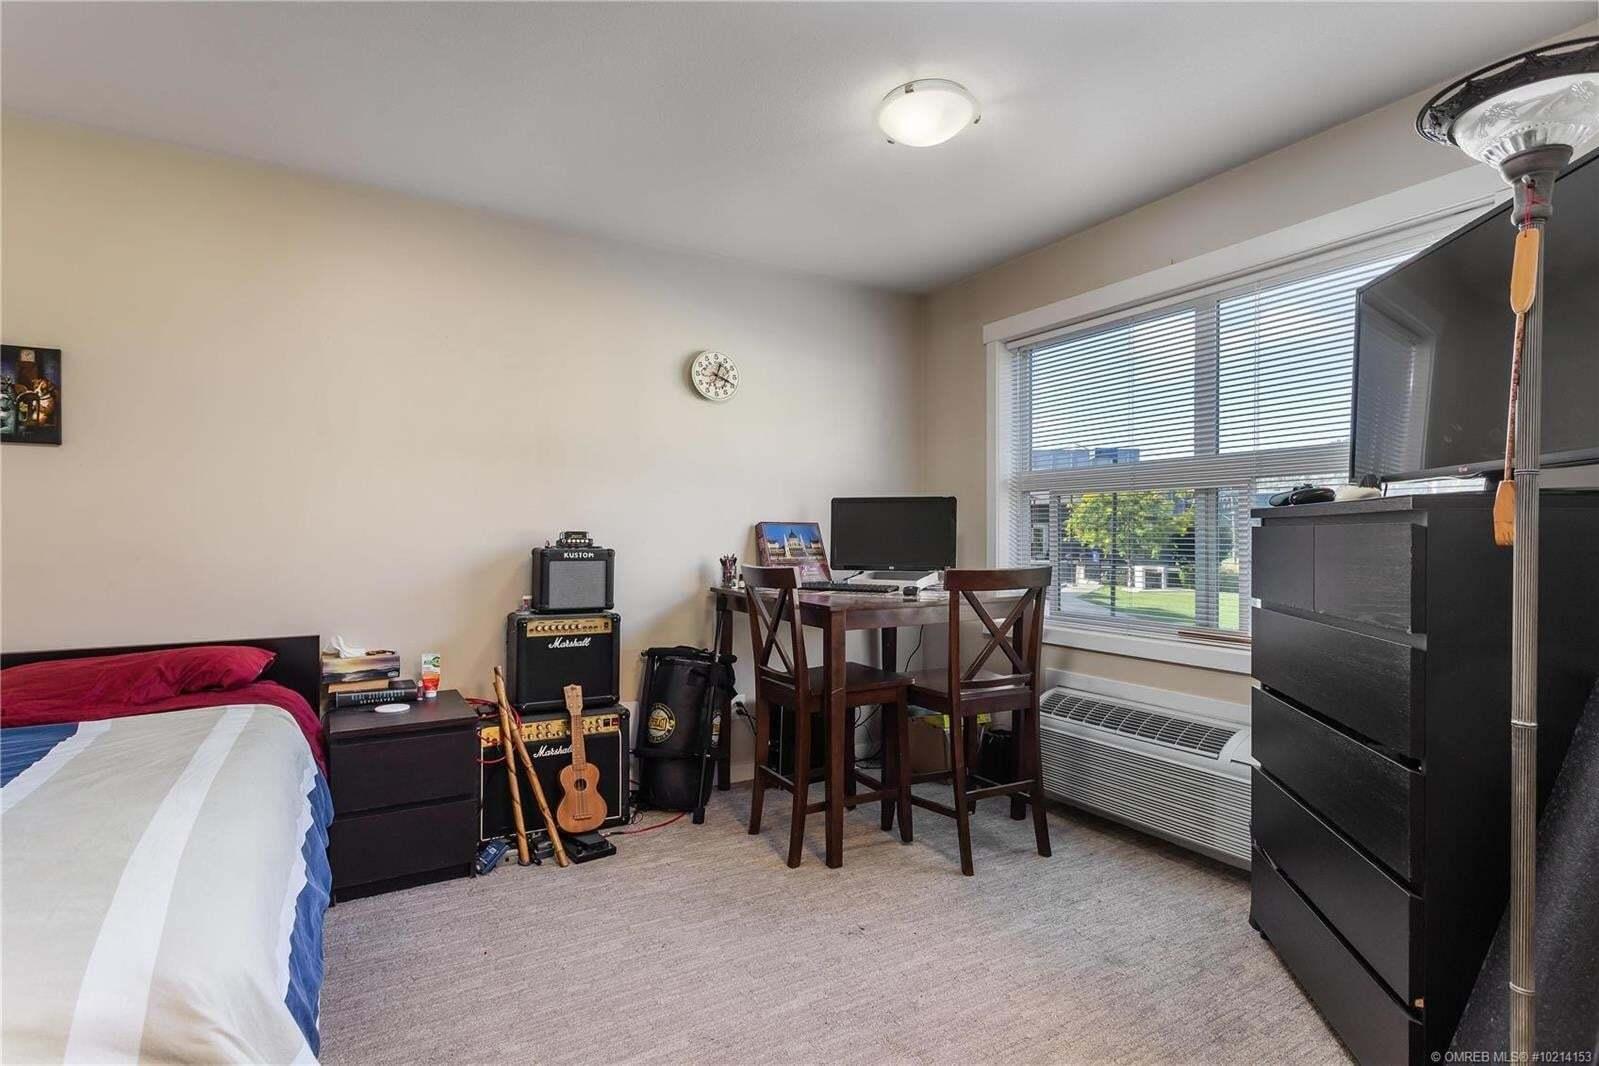 Condo for sale at 1479 Glenmore Rd North Kelowna British Columbia - MLS: 10214153